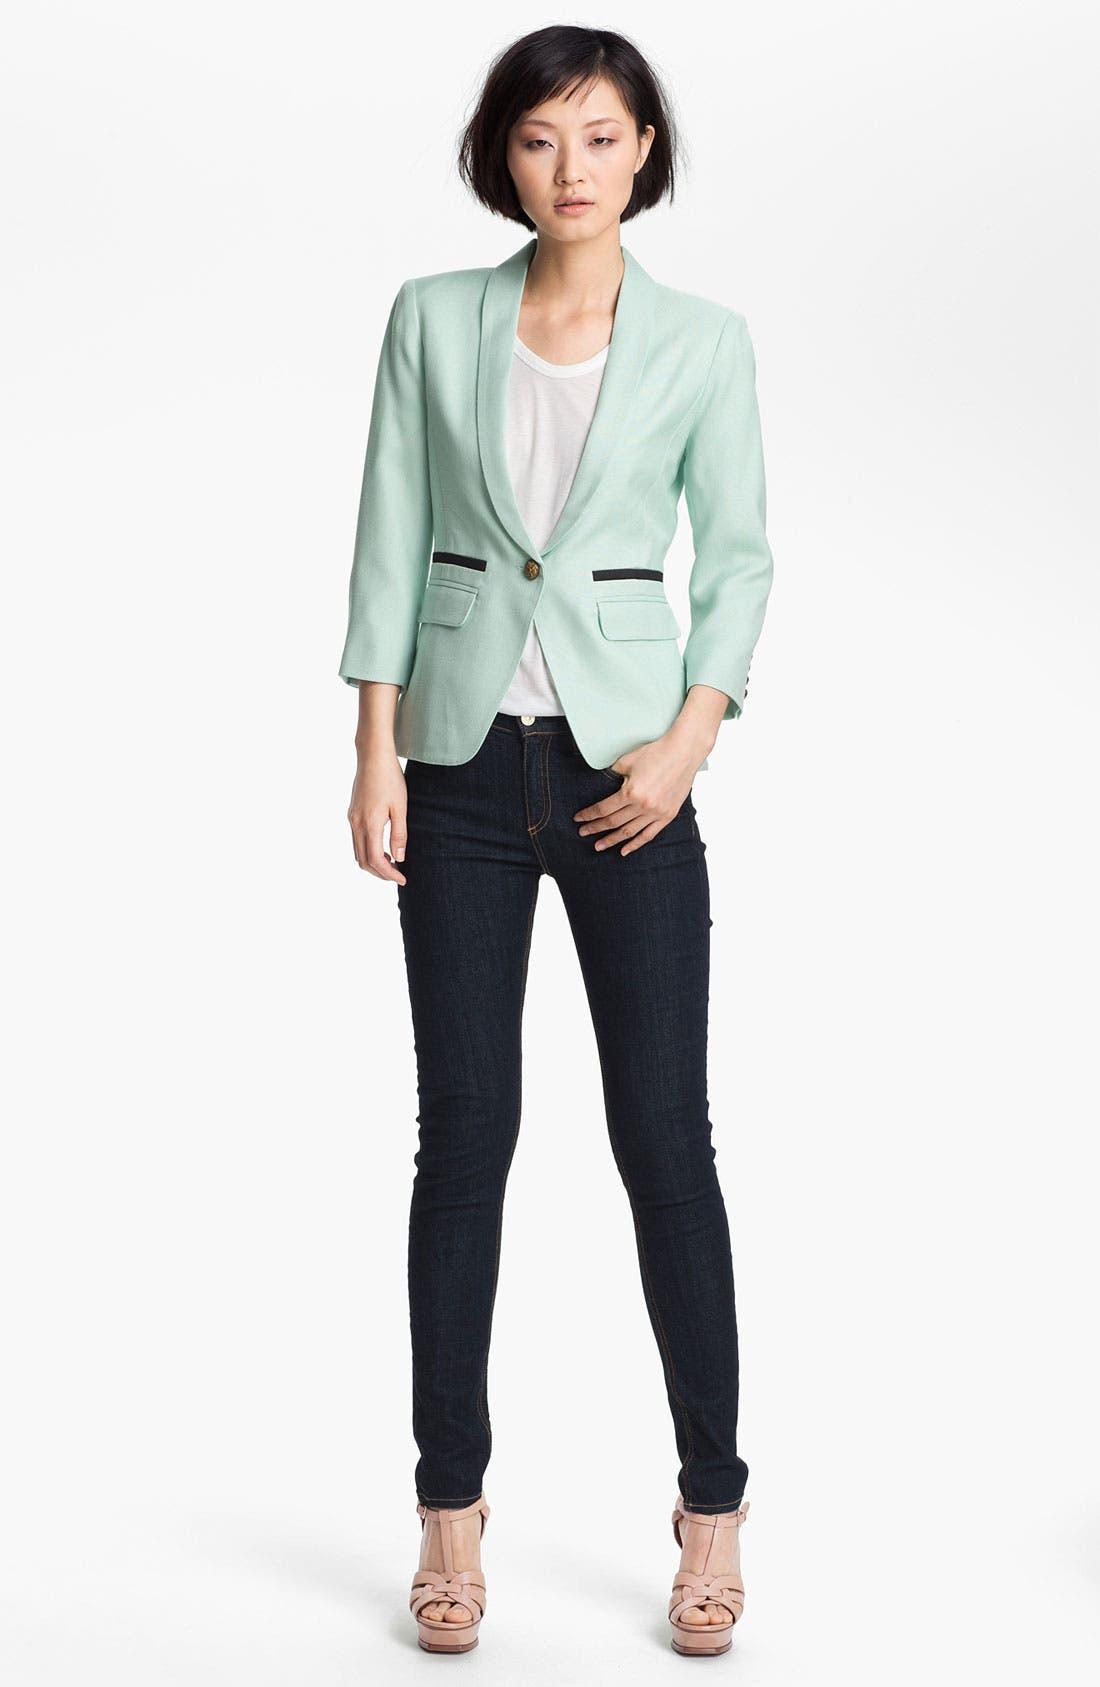 Main Image - Smythe Blazer & rag & bone/JEAN Skinny Jeans